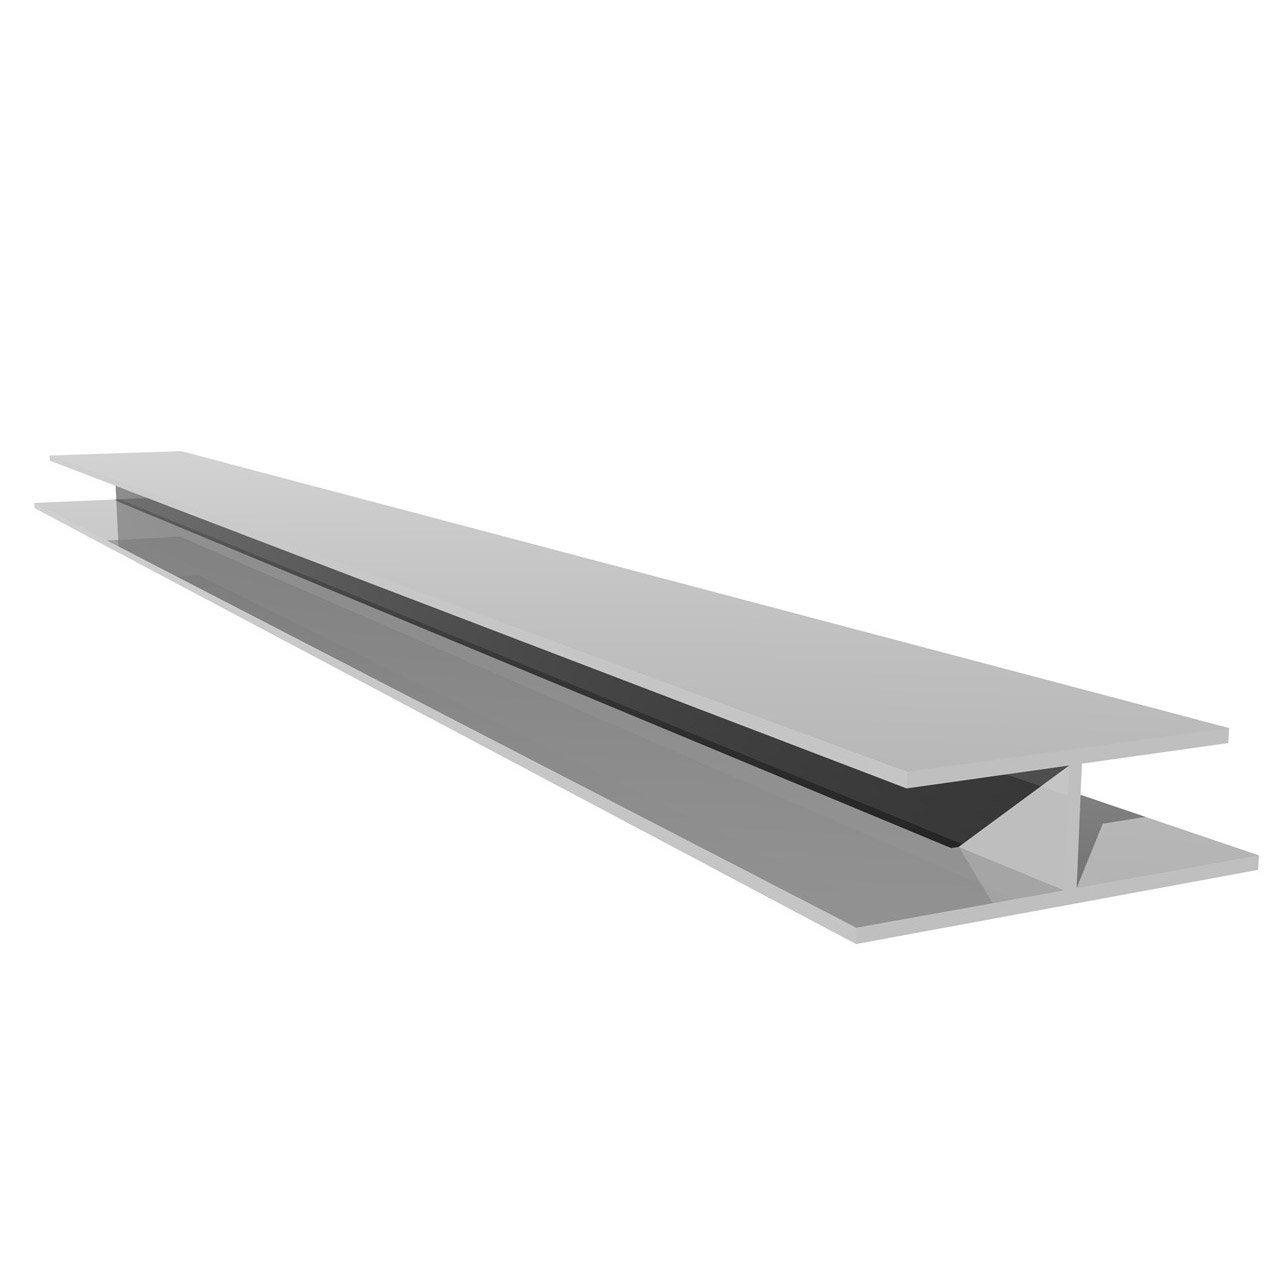 profil de jonction h blanc pvc l 3 m leroy merlin. Black Bedroom Furniture Sets. Home Design Ideas